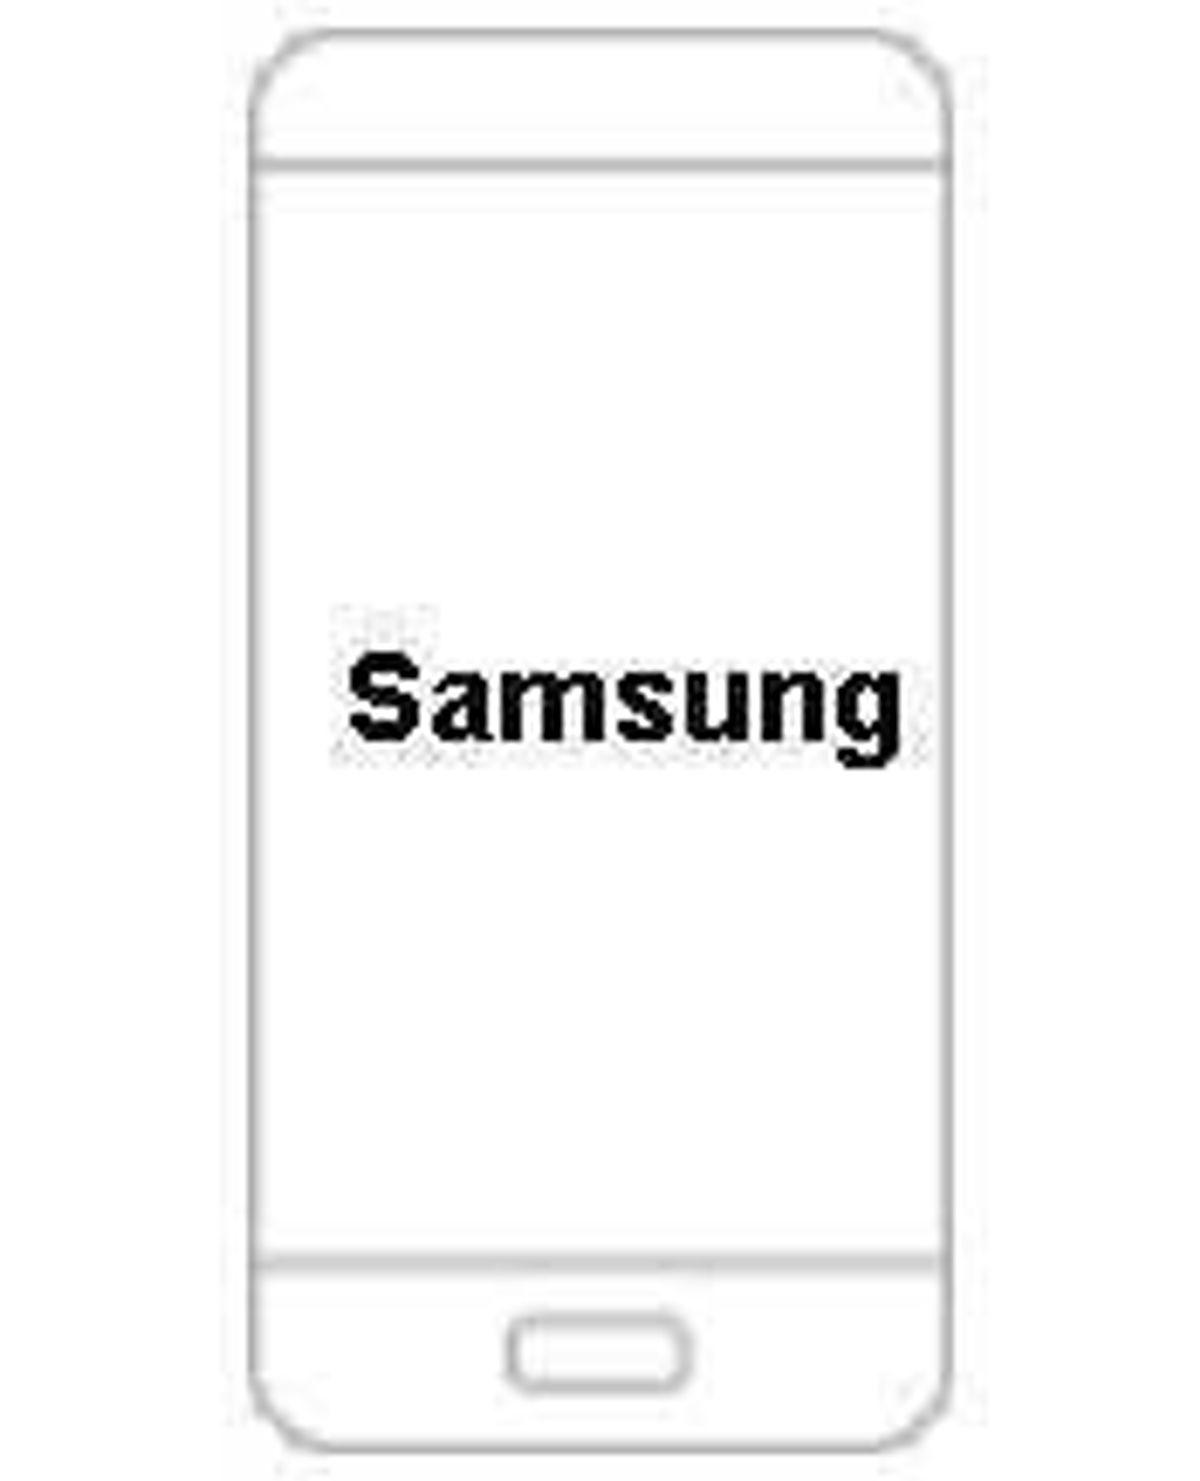 सॅमसंग गॅलेक्सी A72 4G